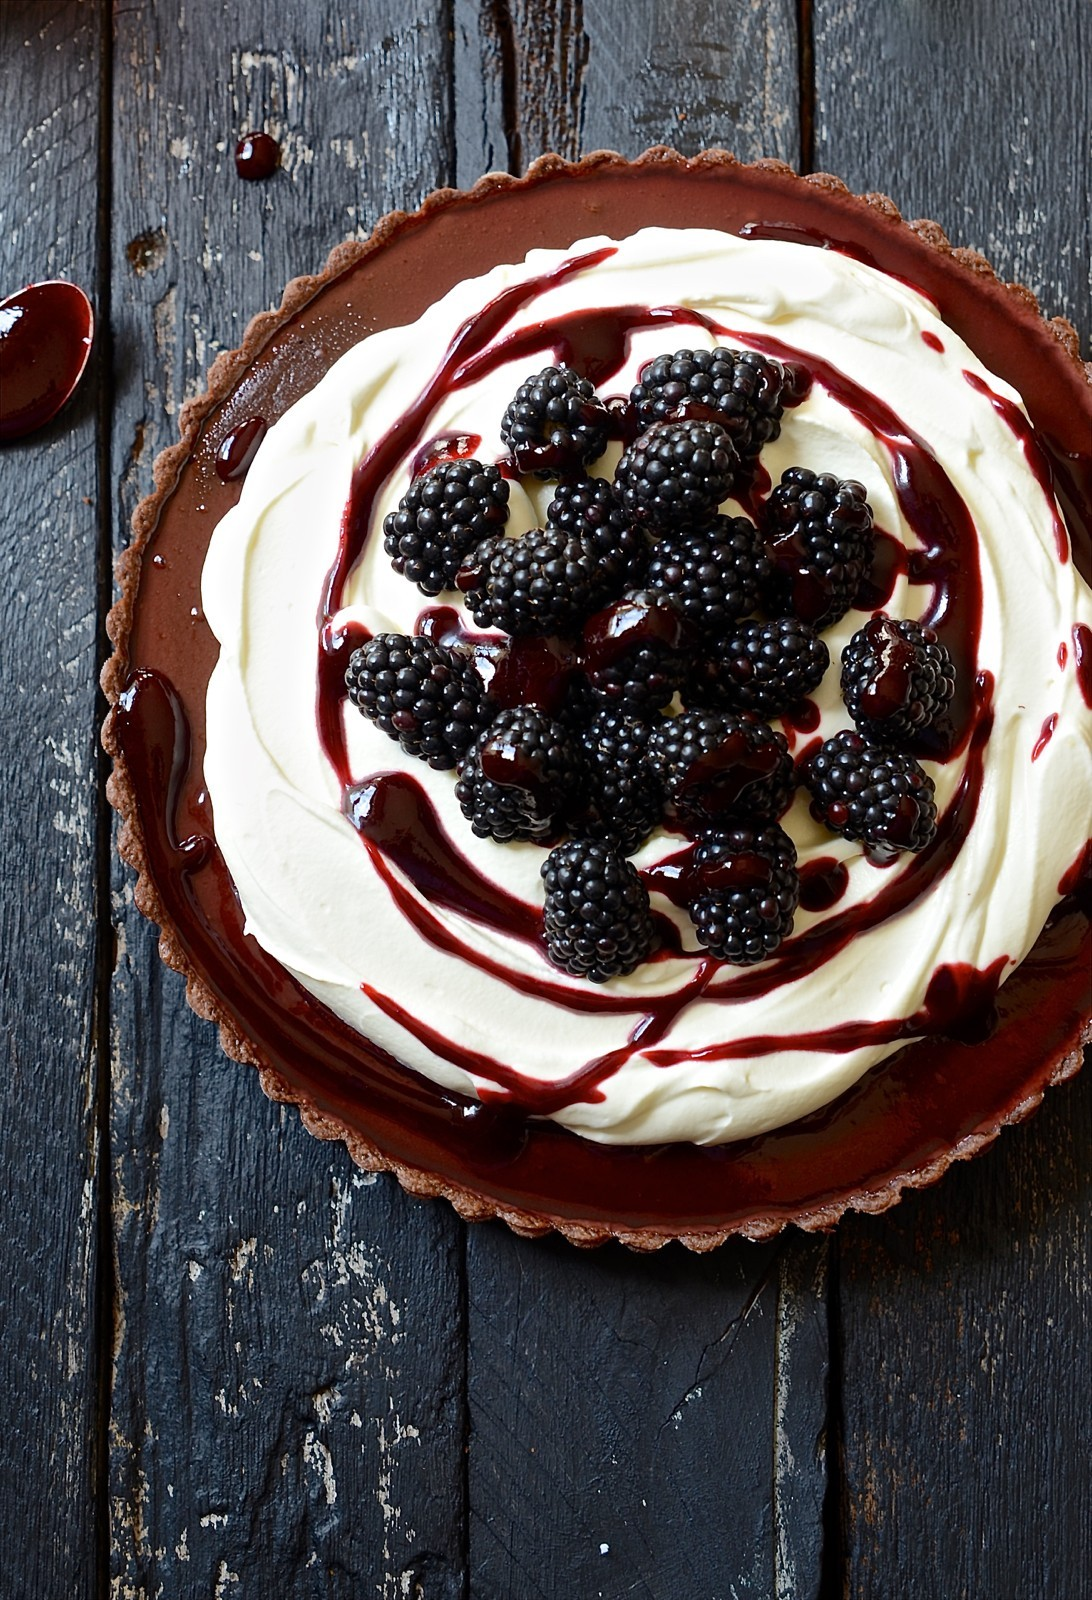 Baked blackberry chocolate fondant tart